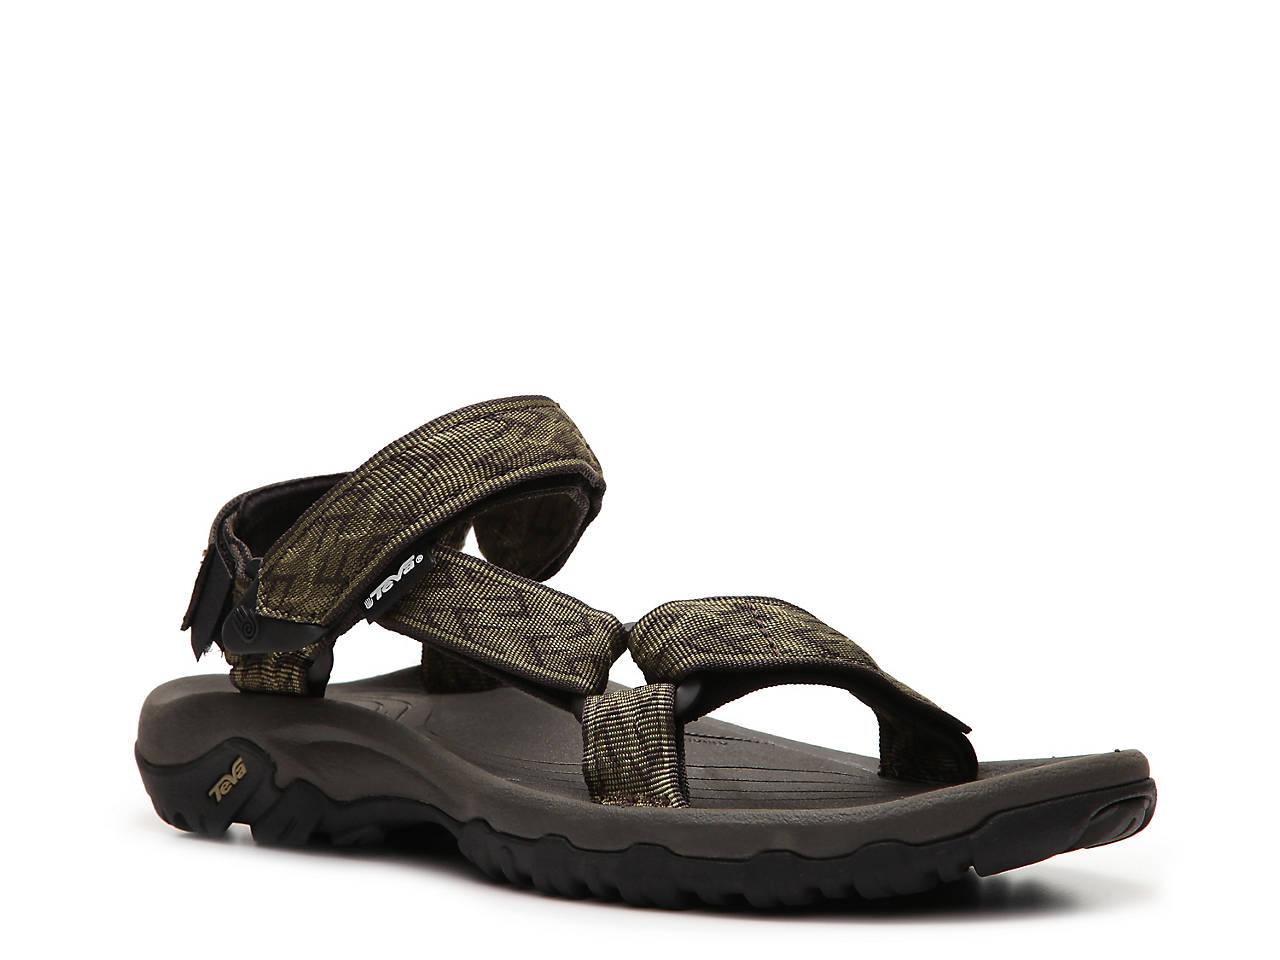 62ccdaacf0cc61 Teva Hurricane XLT Sandal Men s Shoes